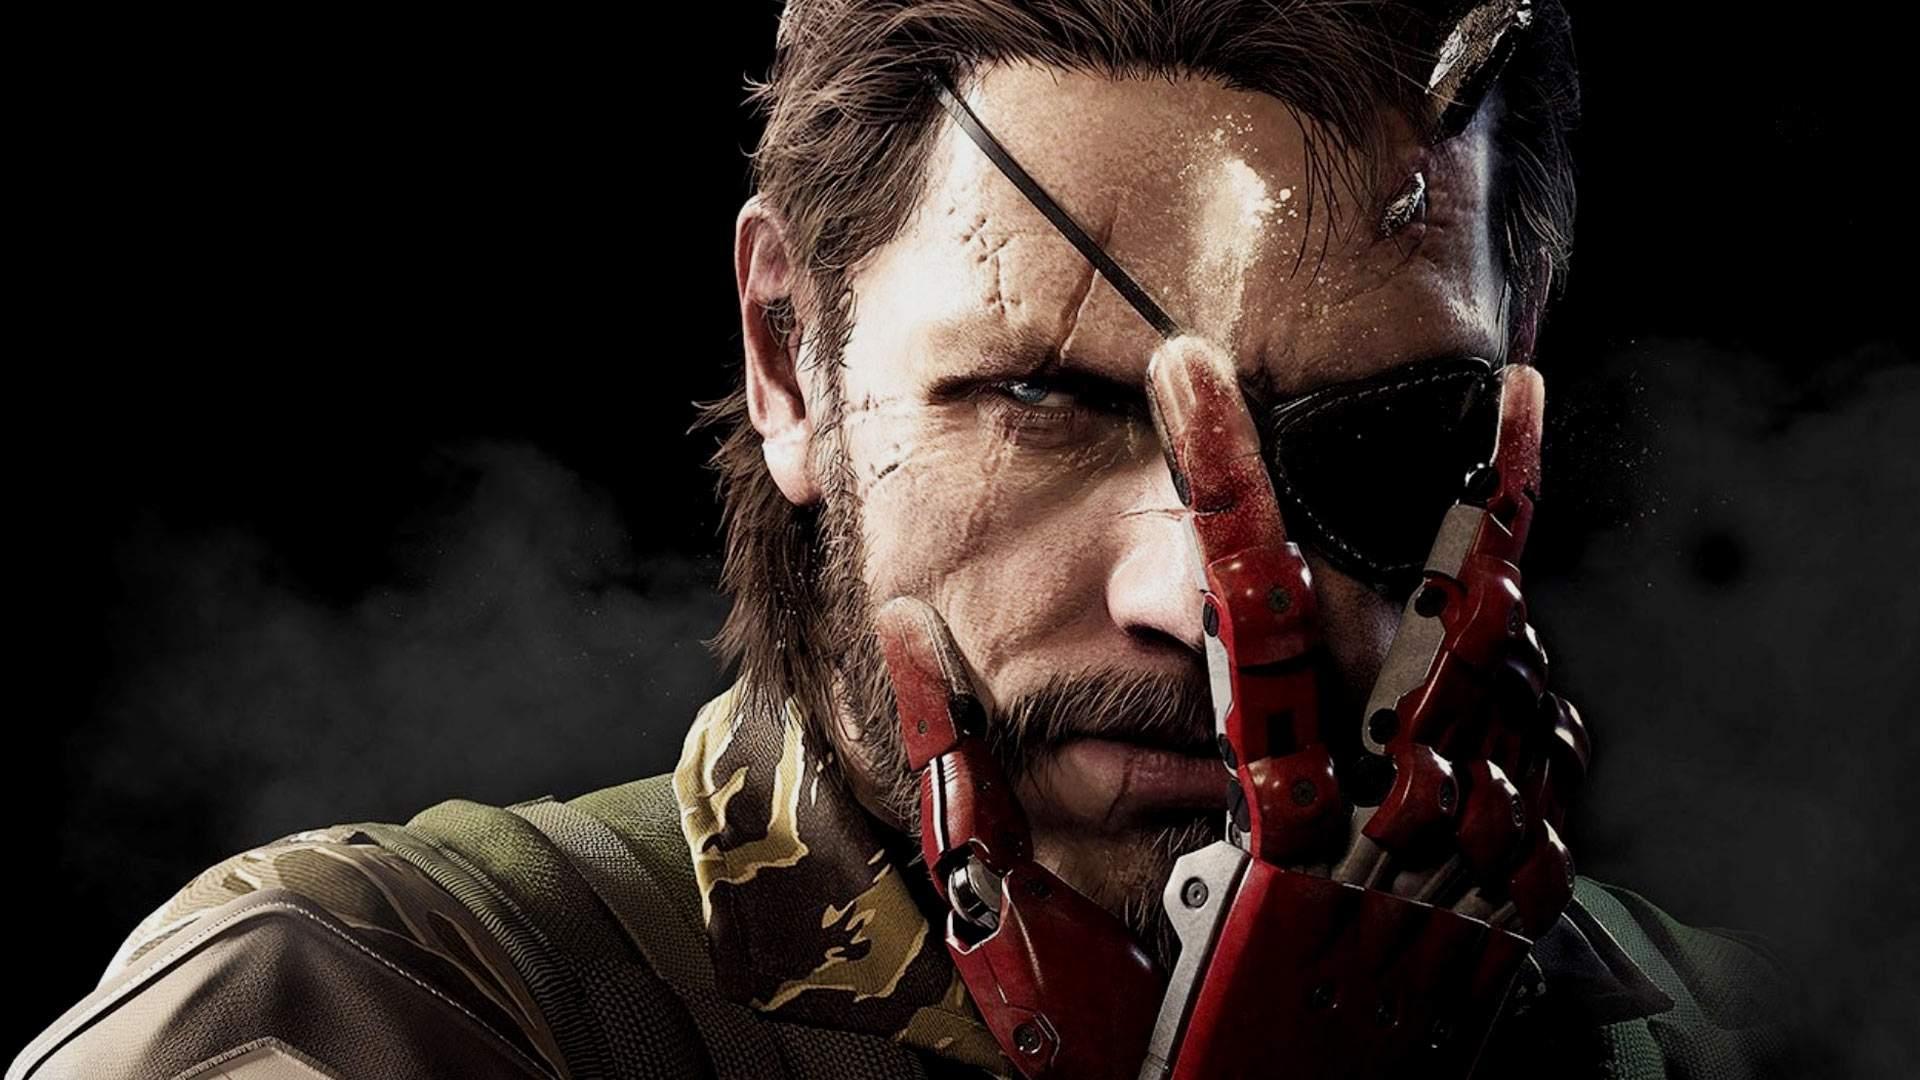 big-boss-bionic-arm-metal-gear-solid-v-the-phantom-pain-wallpaper-hd-desktop.jpg